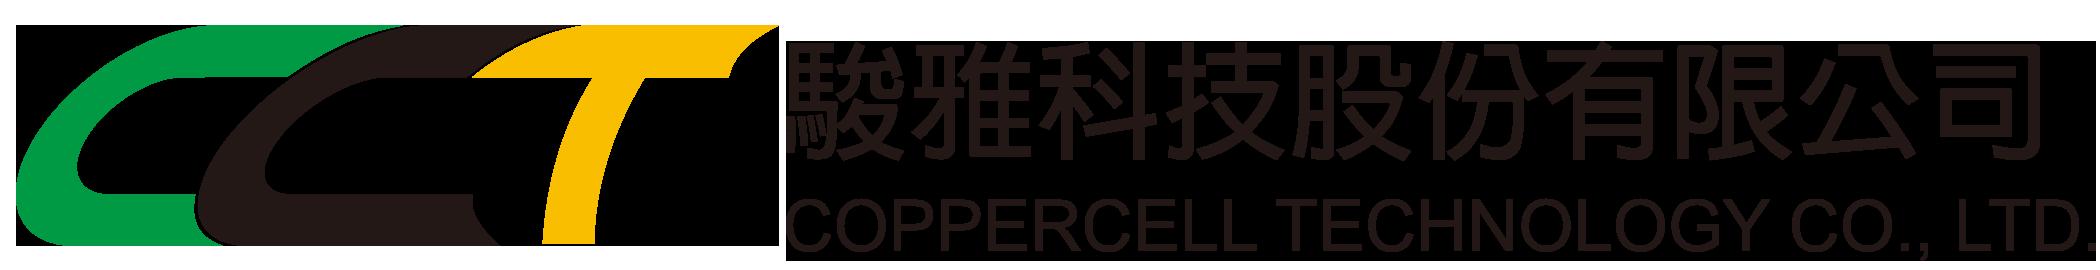 Coppercell | 駿雅科技股份有限公司